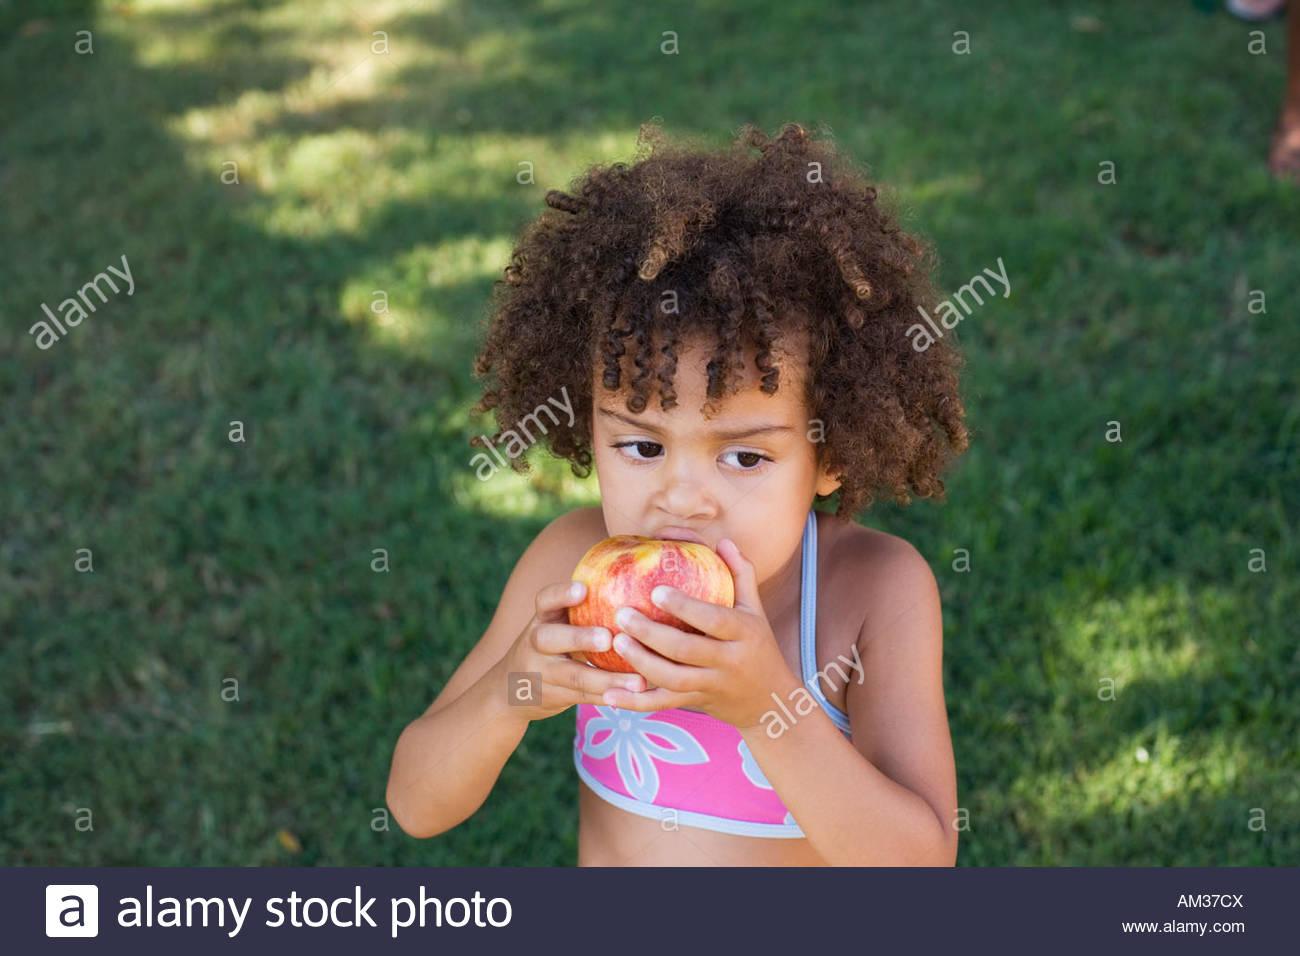 Girl in swimwear eating apple in yard - Stock Image